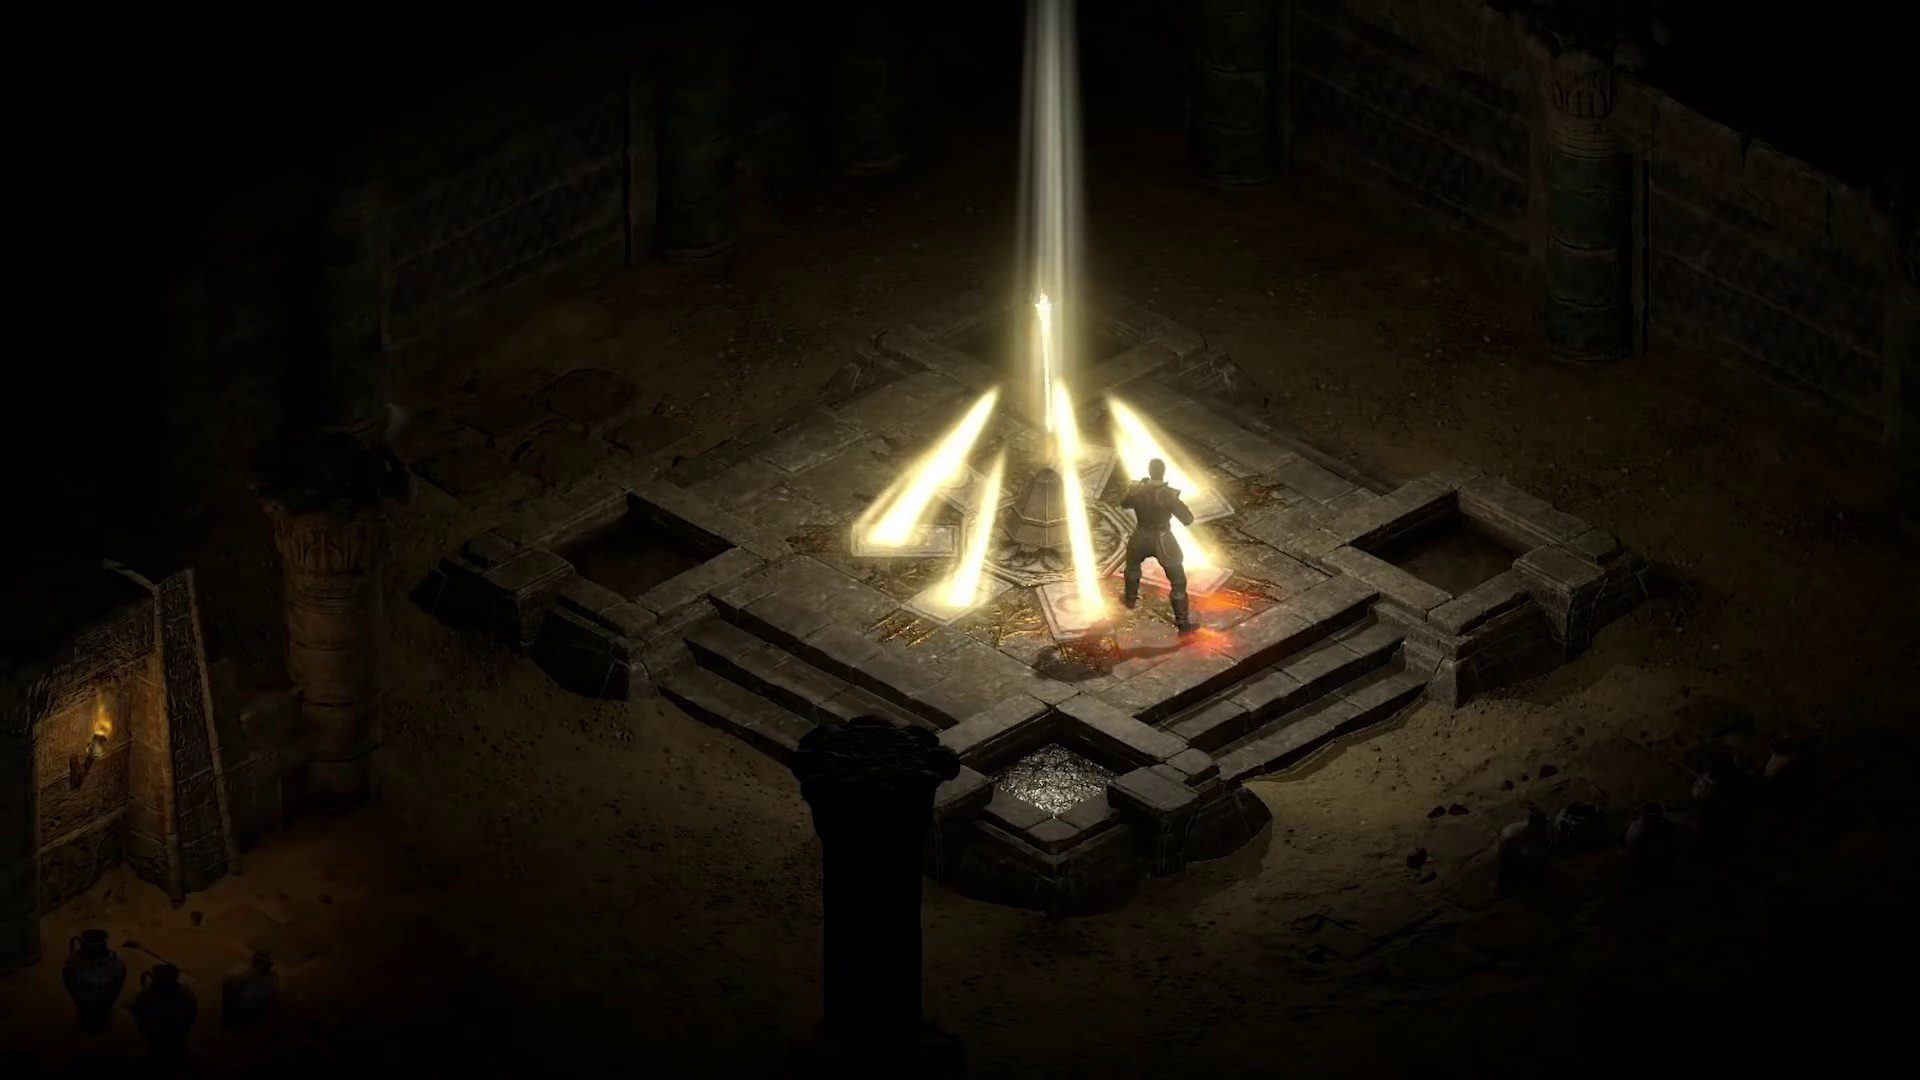 Differences Between Diablo II Resurrected and The Original Game